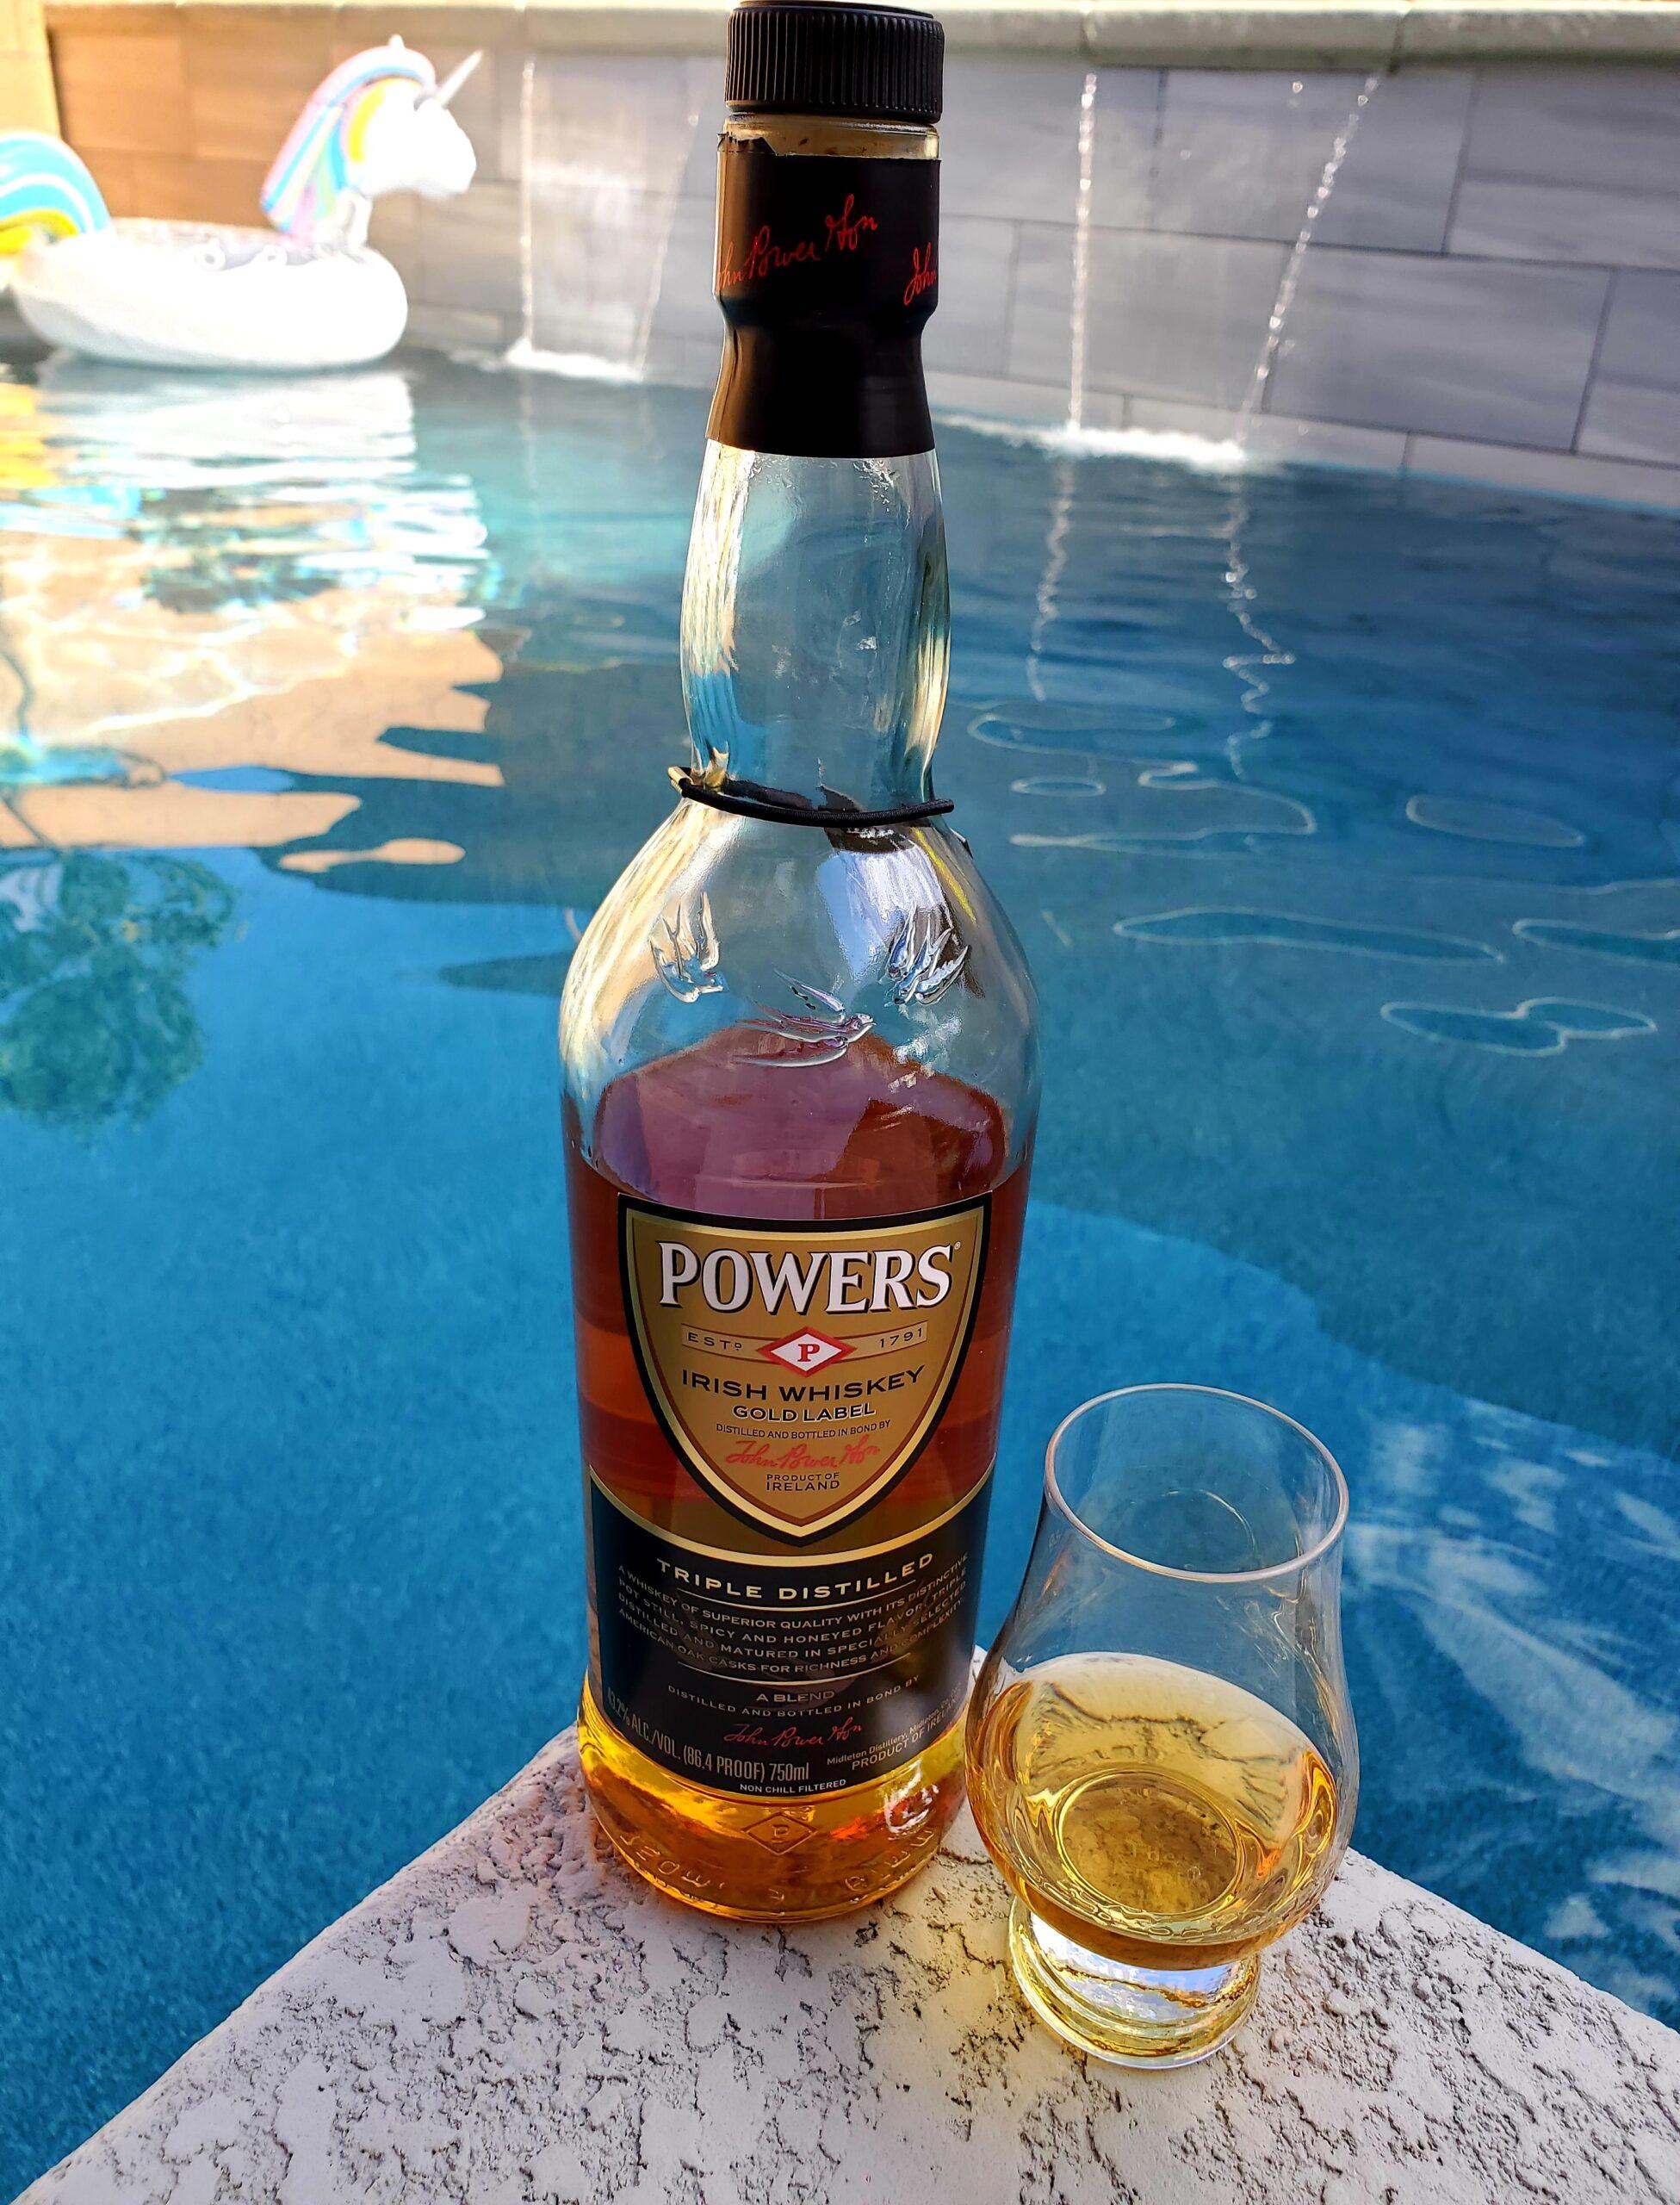 Powers Irish Whiskey The Whiskey Noob review